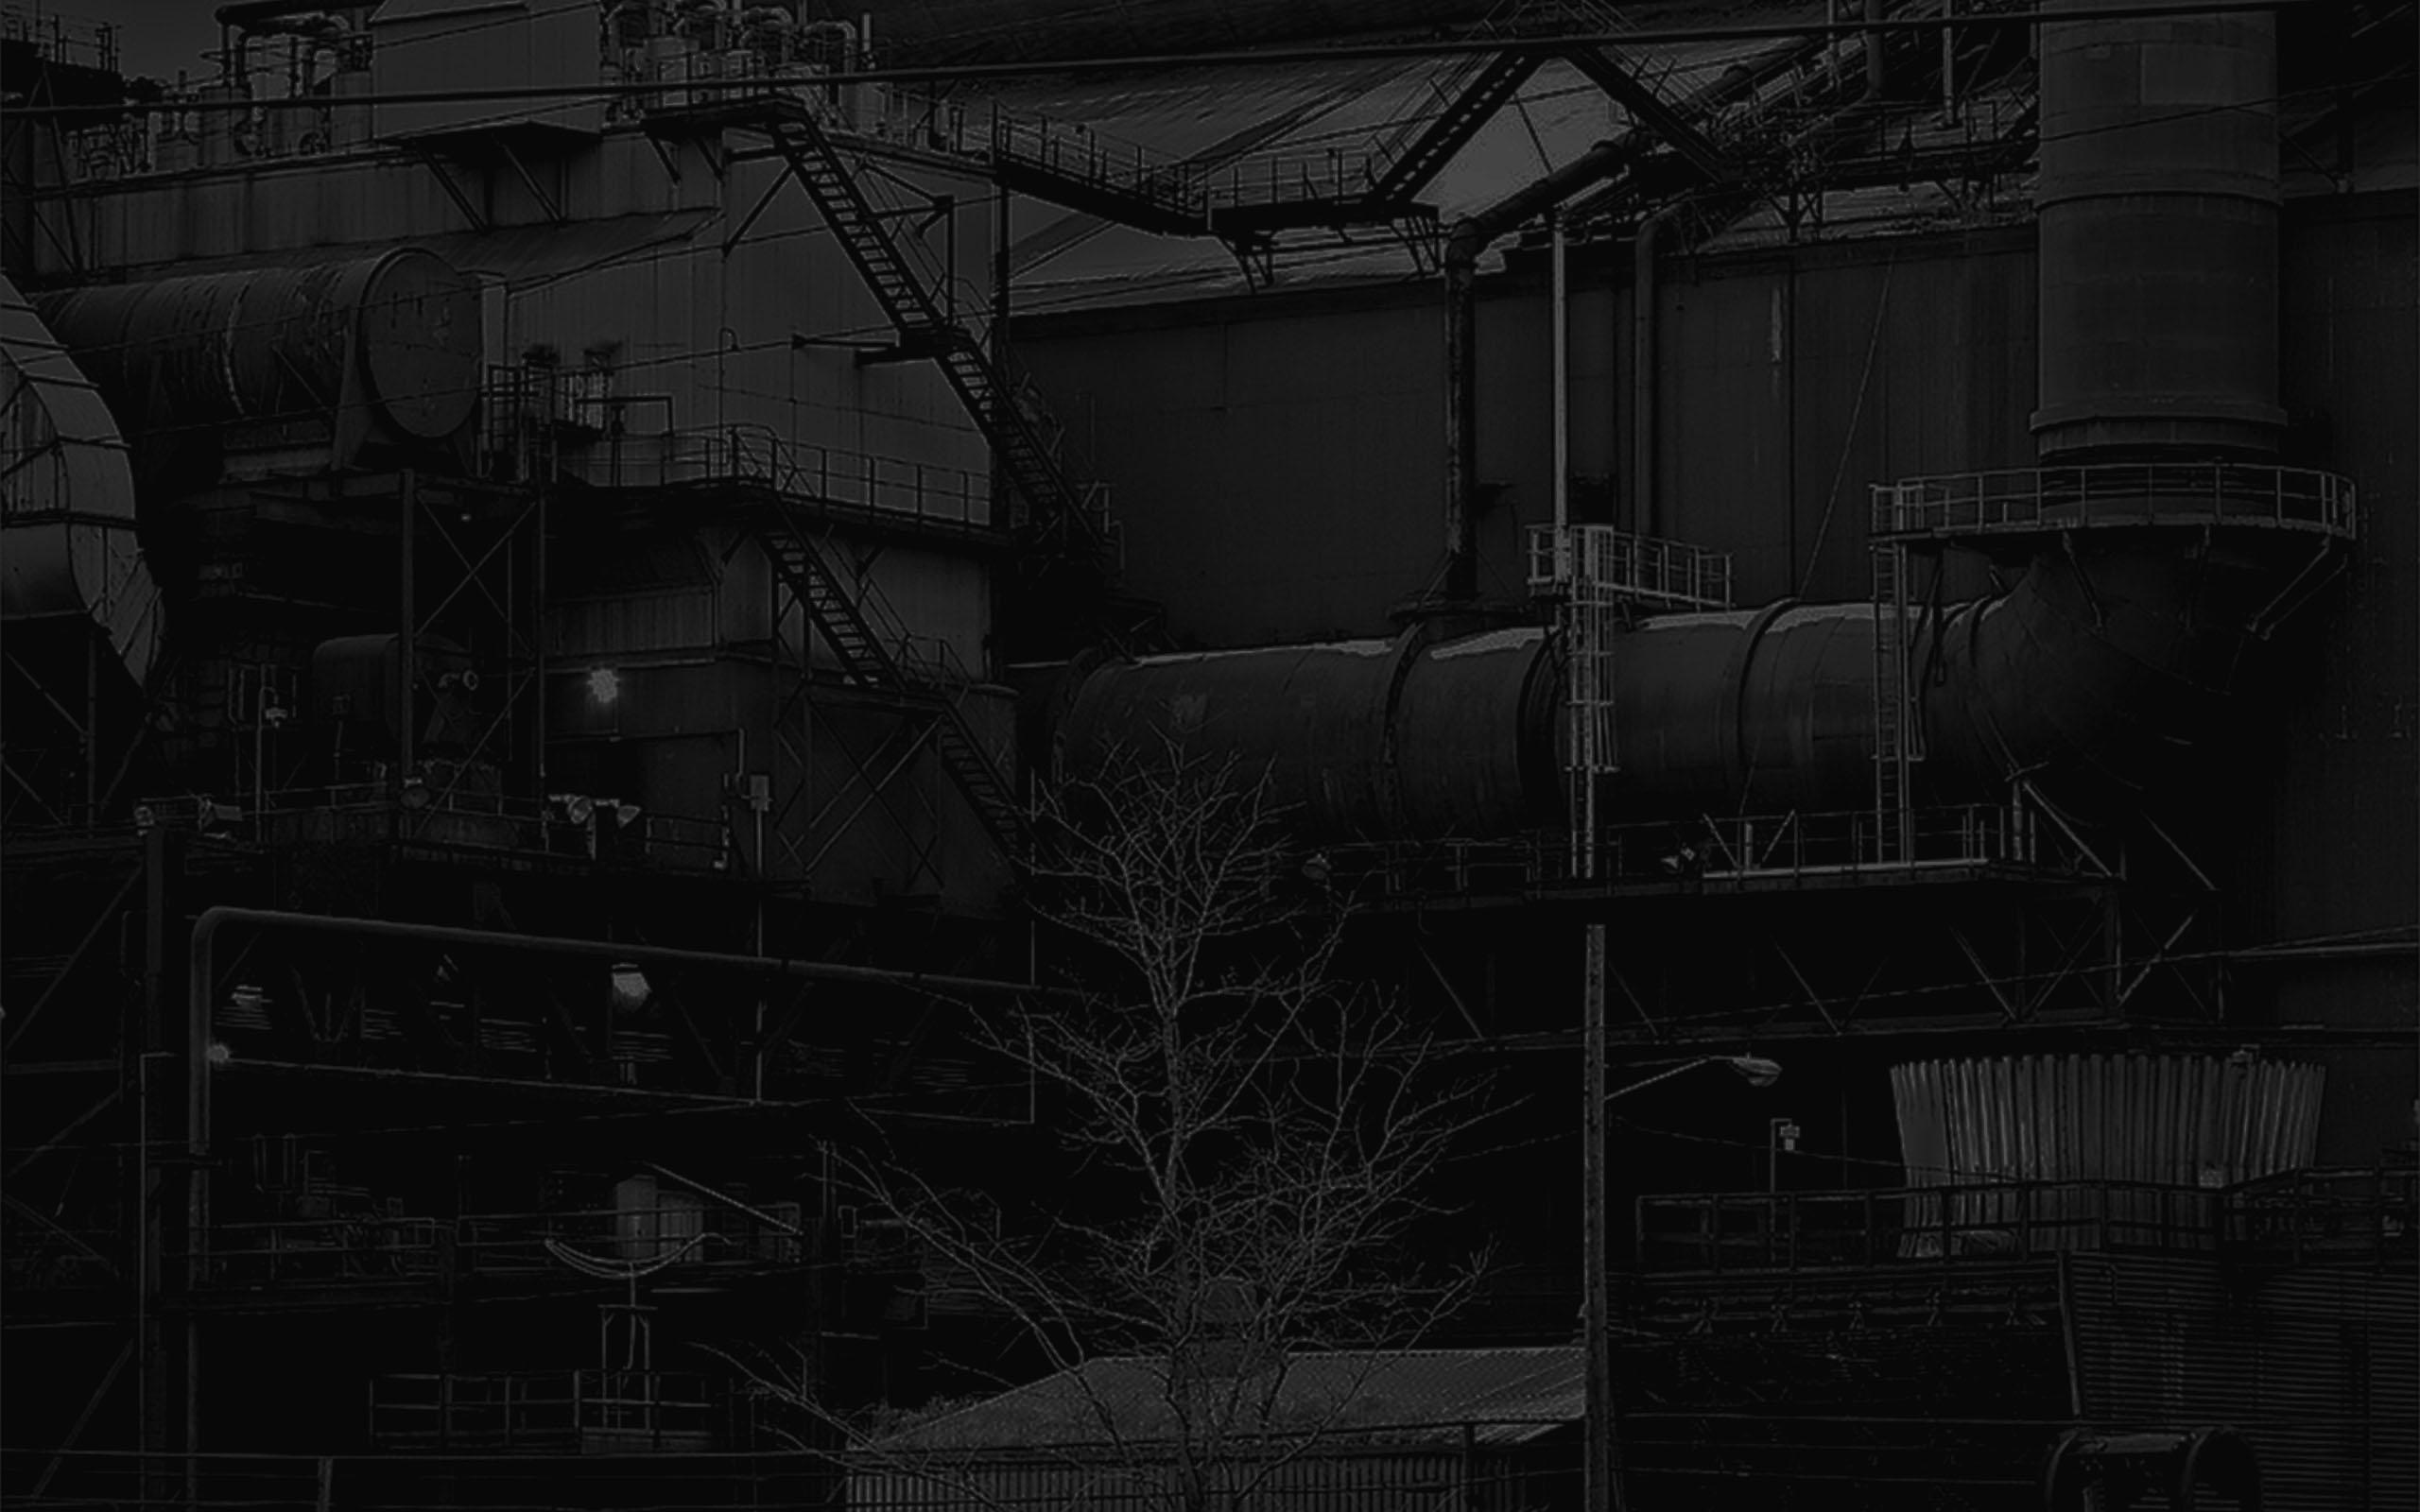 steel service enterprises